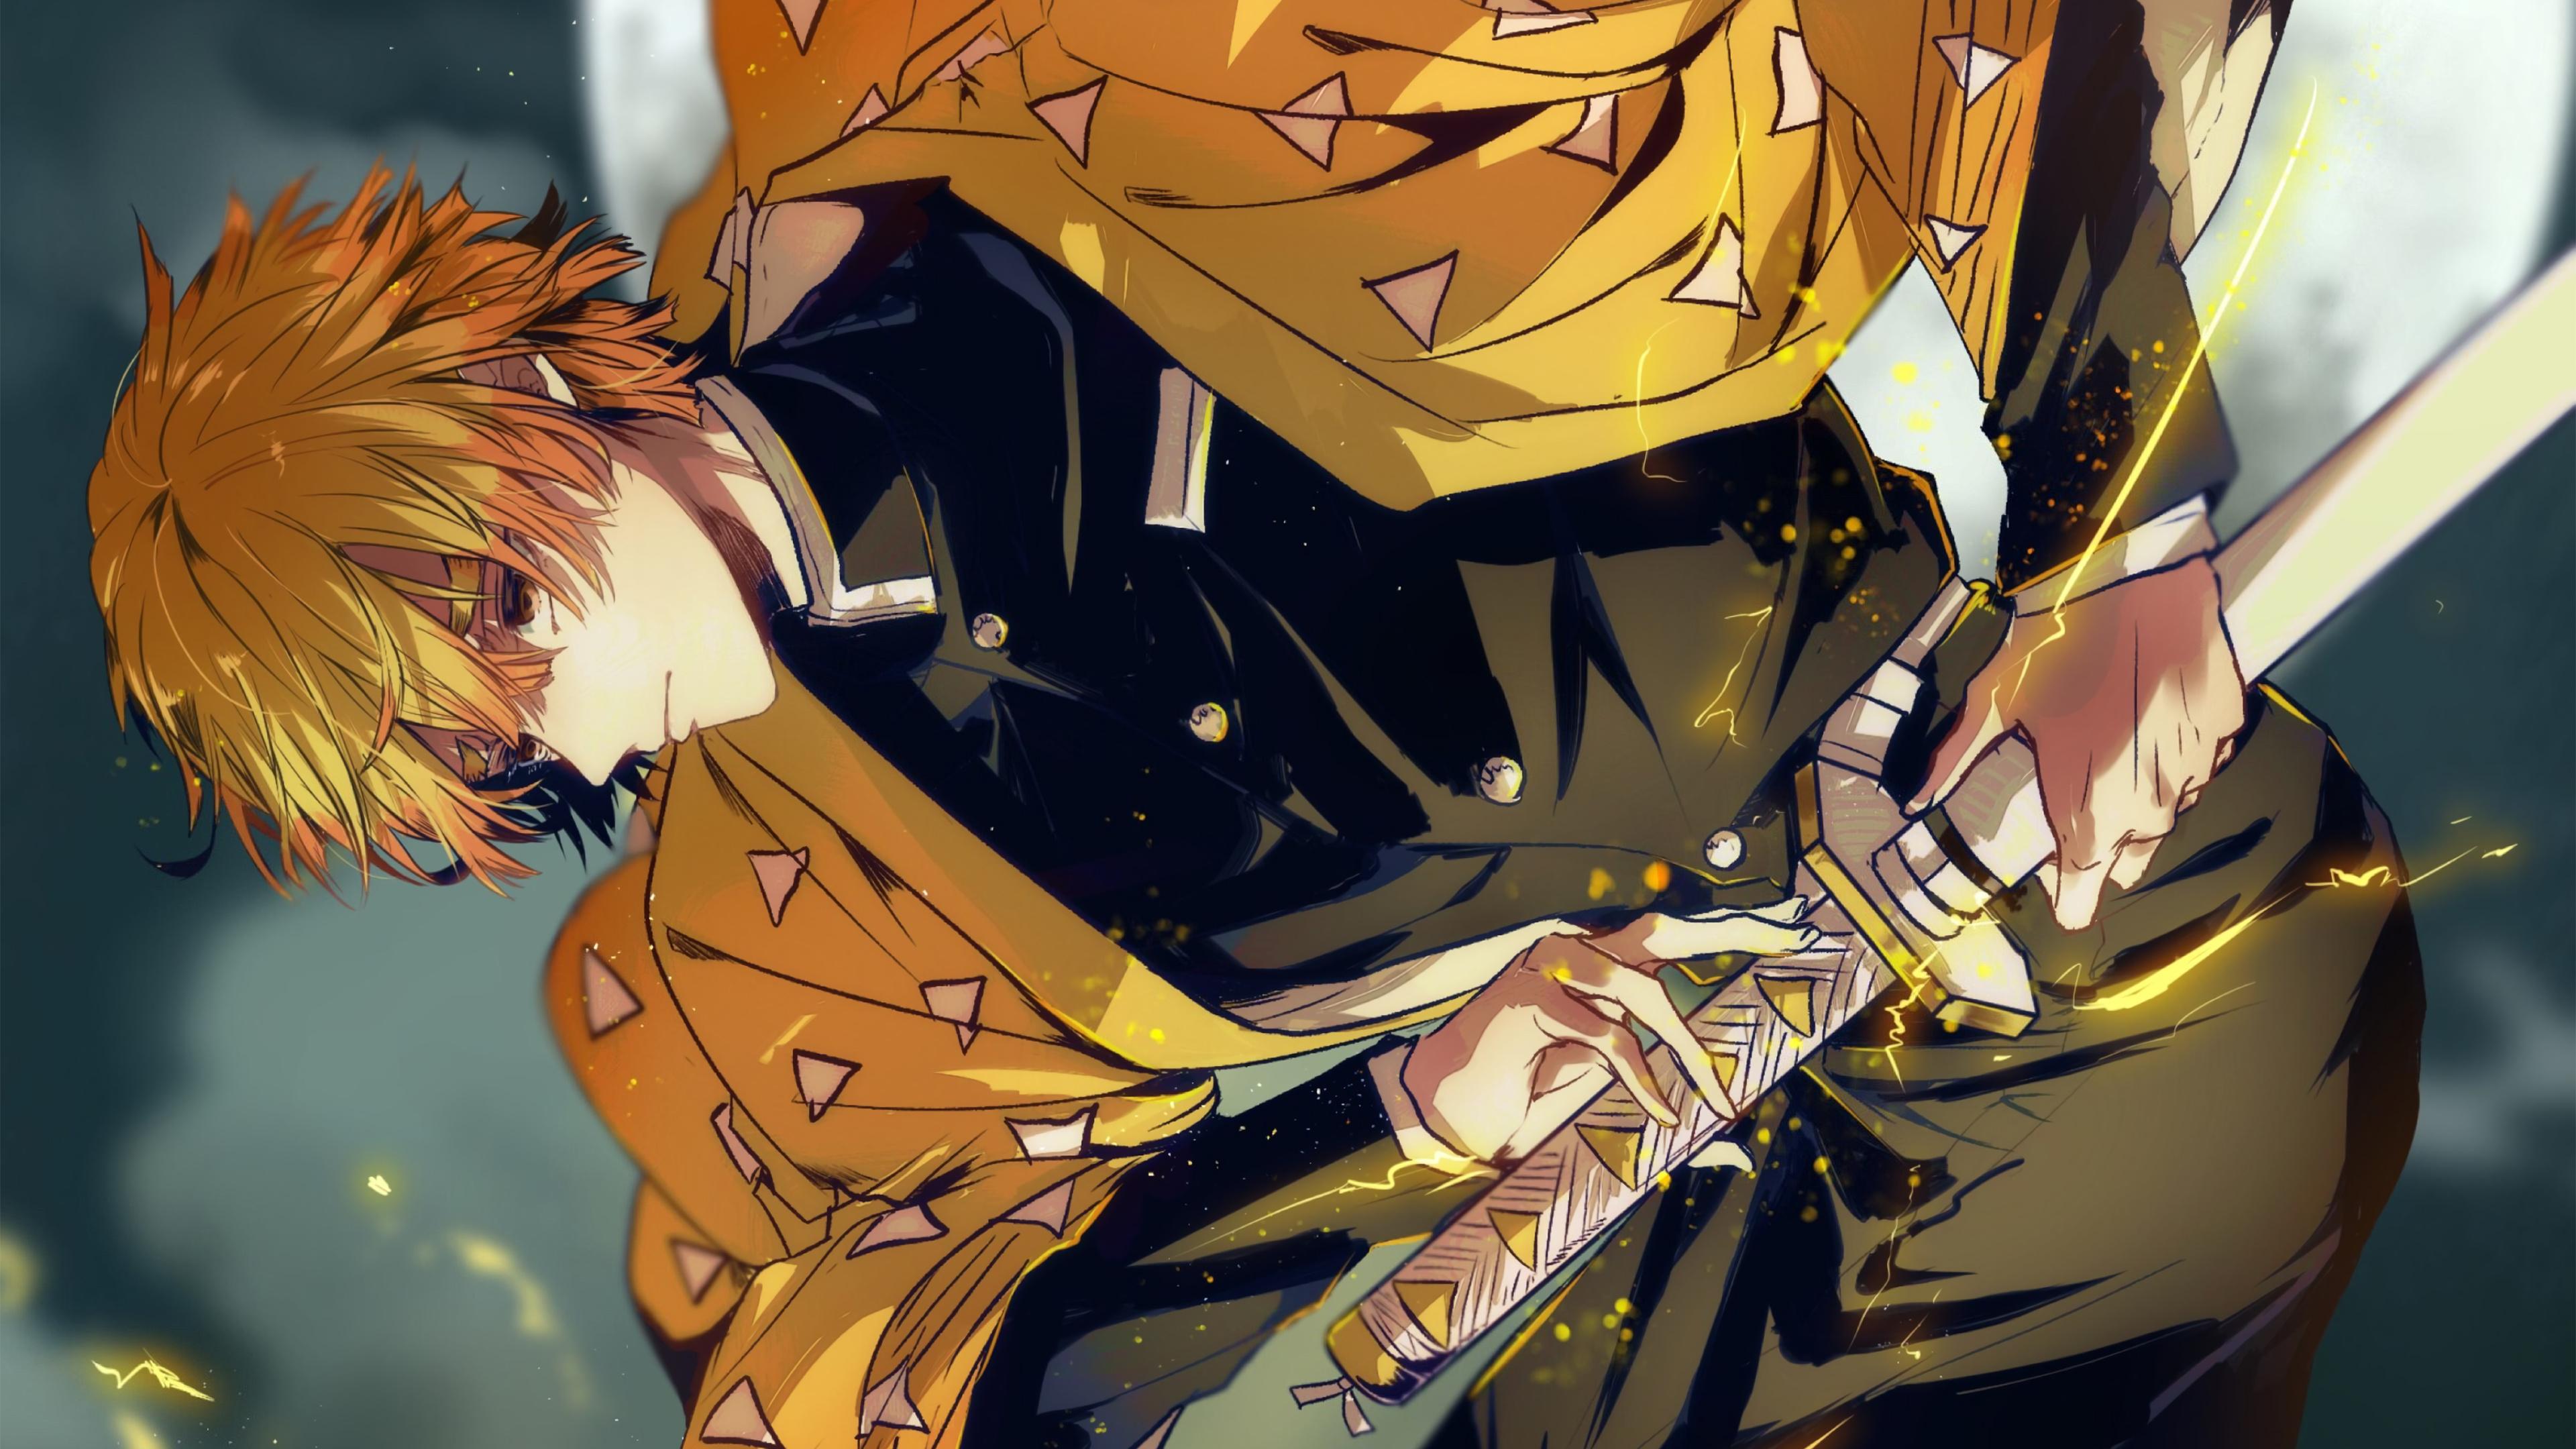 Wallpaper Kimetsu No Yaiba Zenitsu Agatsuma Anime 3840x2160 Midriffmadness 1692993 Hd Wallpapers Wallhere